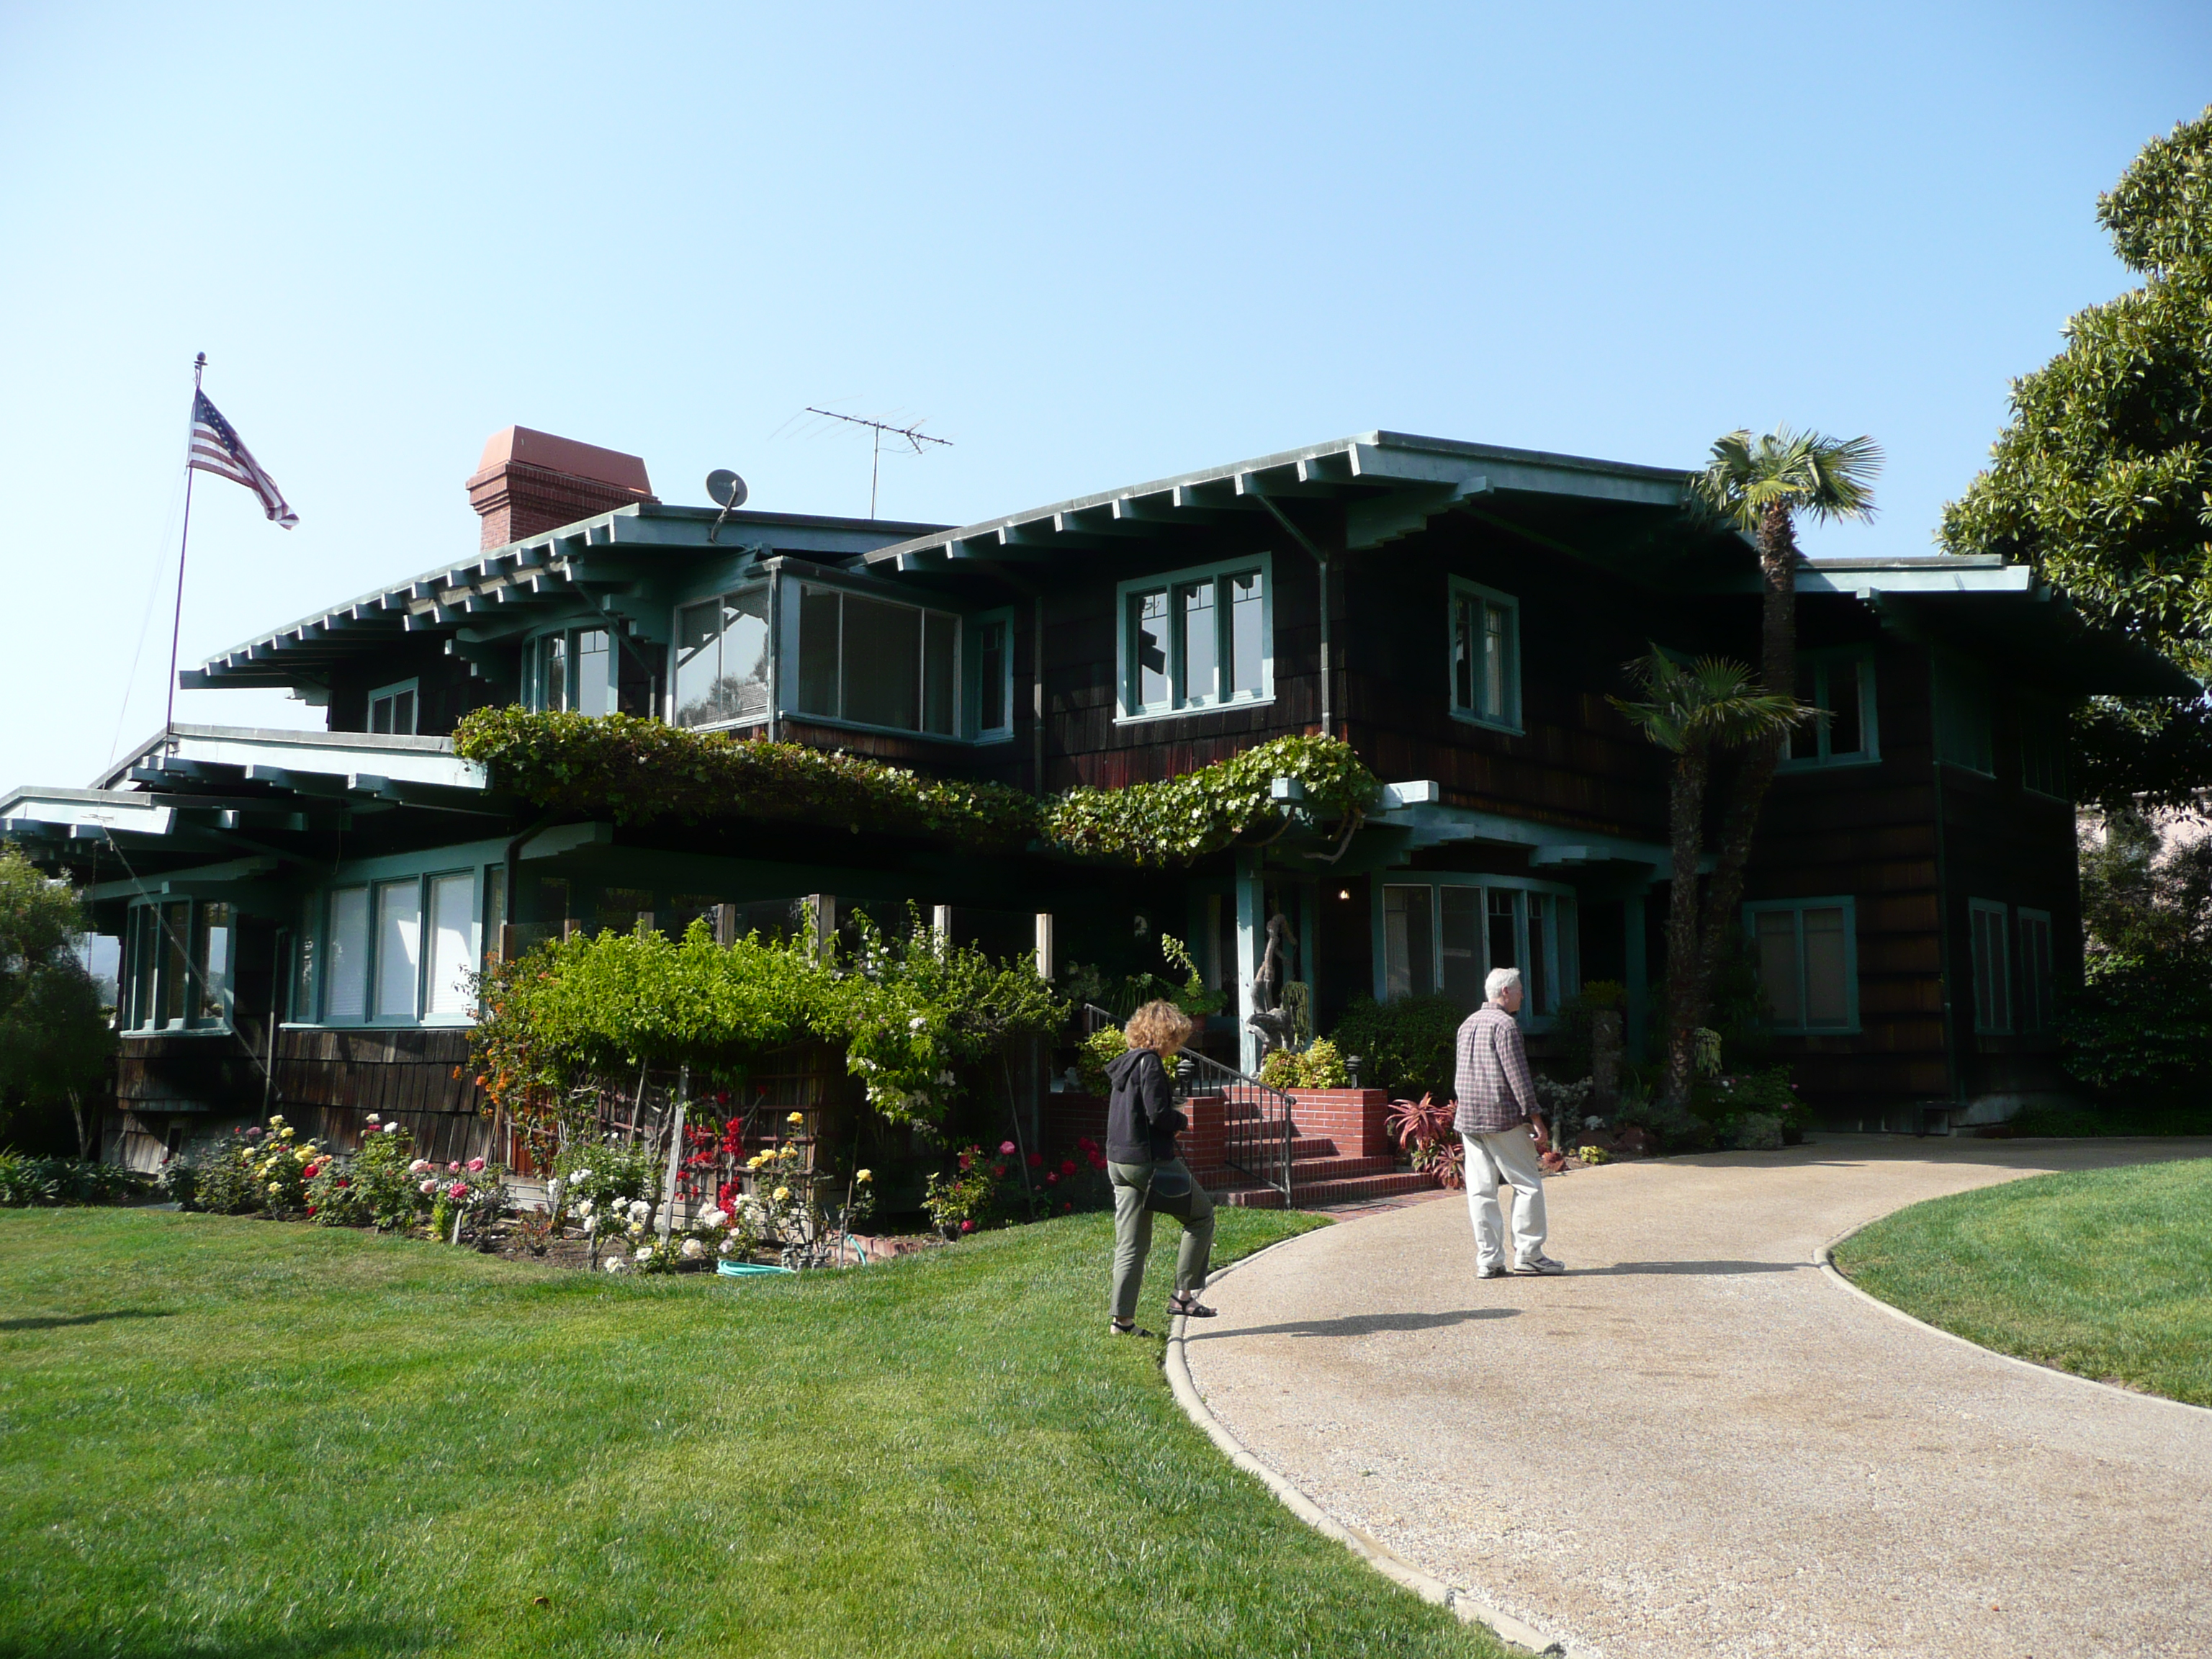 Santa monica landmark home for sale kim kristine for House for sale in santa monica